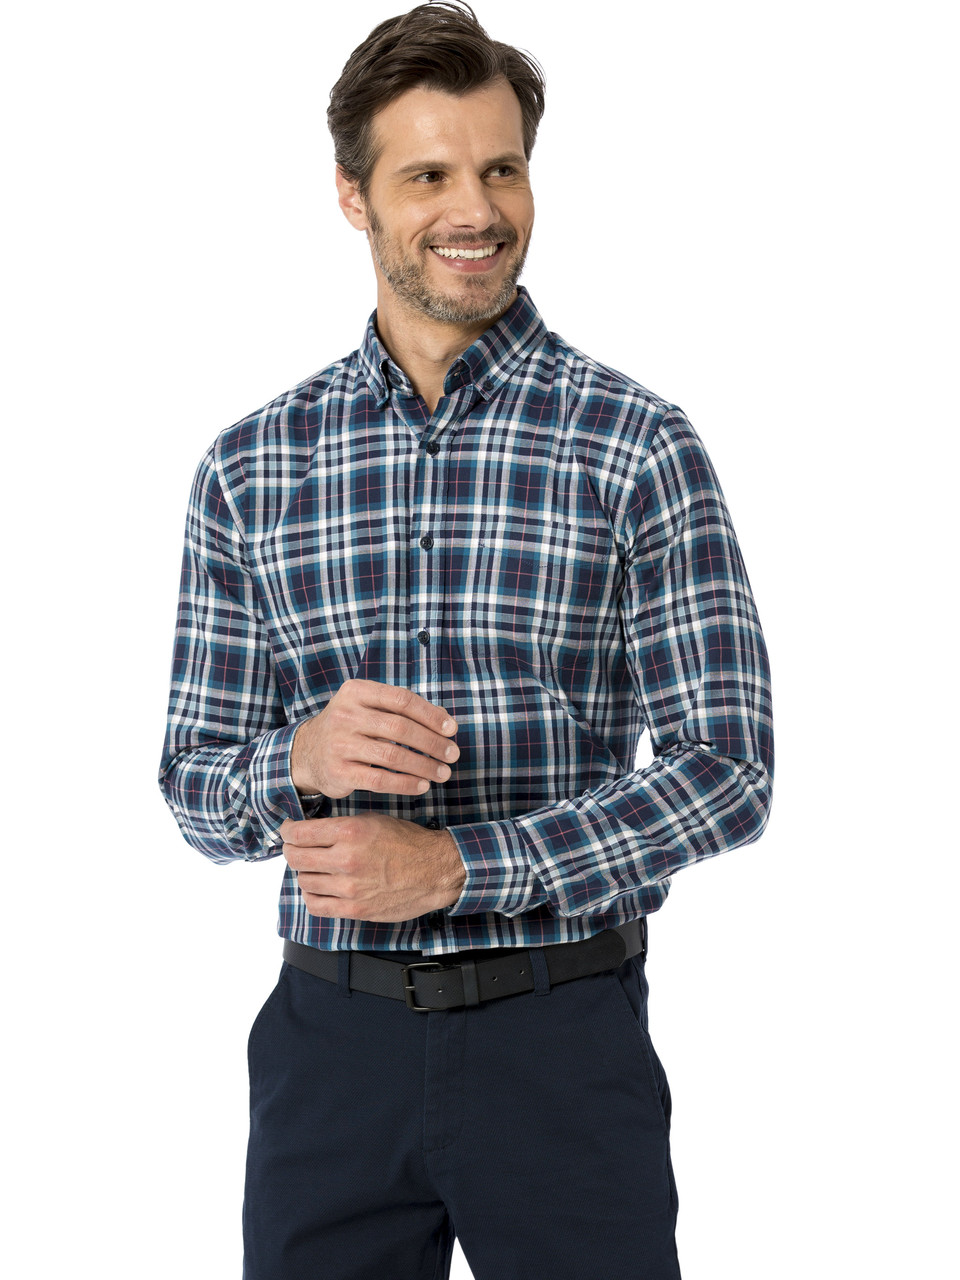 Синяя мужская рубашка LC Waikiki / ЛС Вайкики в бело-бирюзовую клетку, с карманом на груди